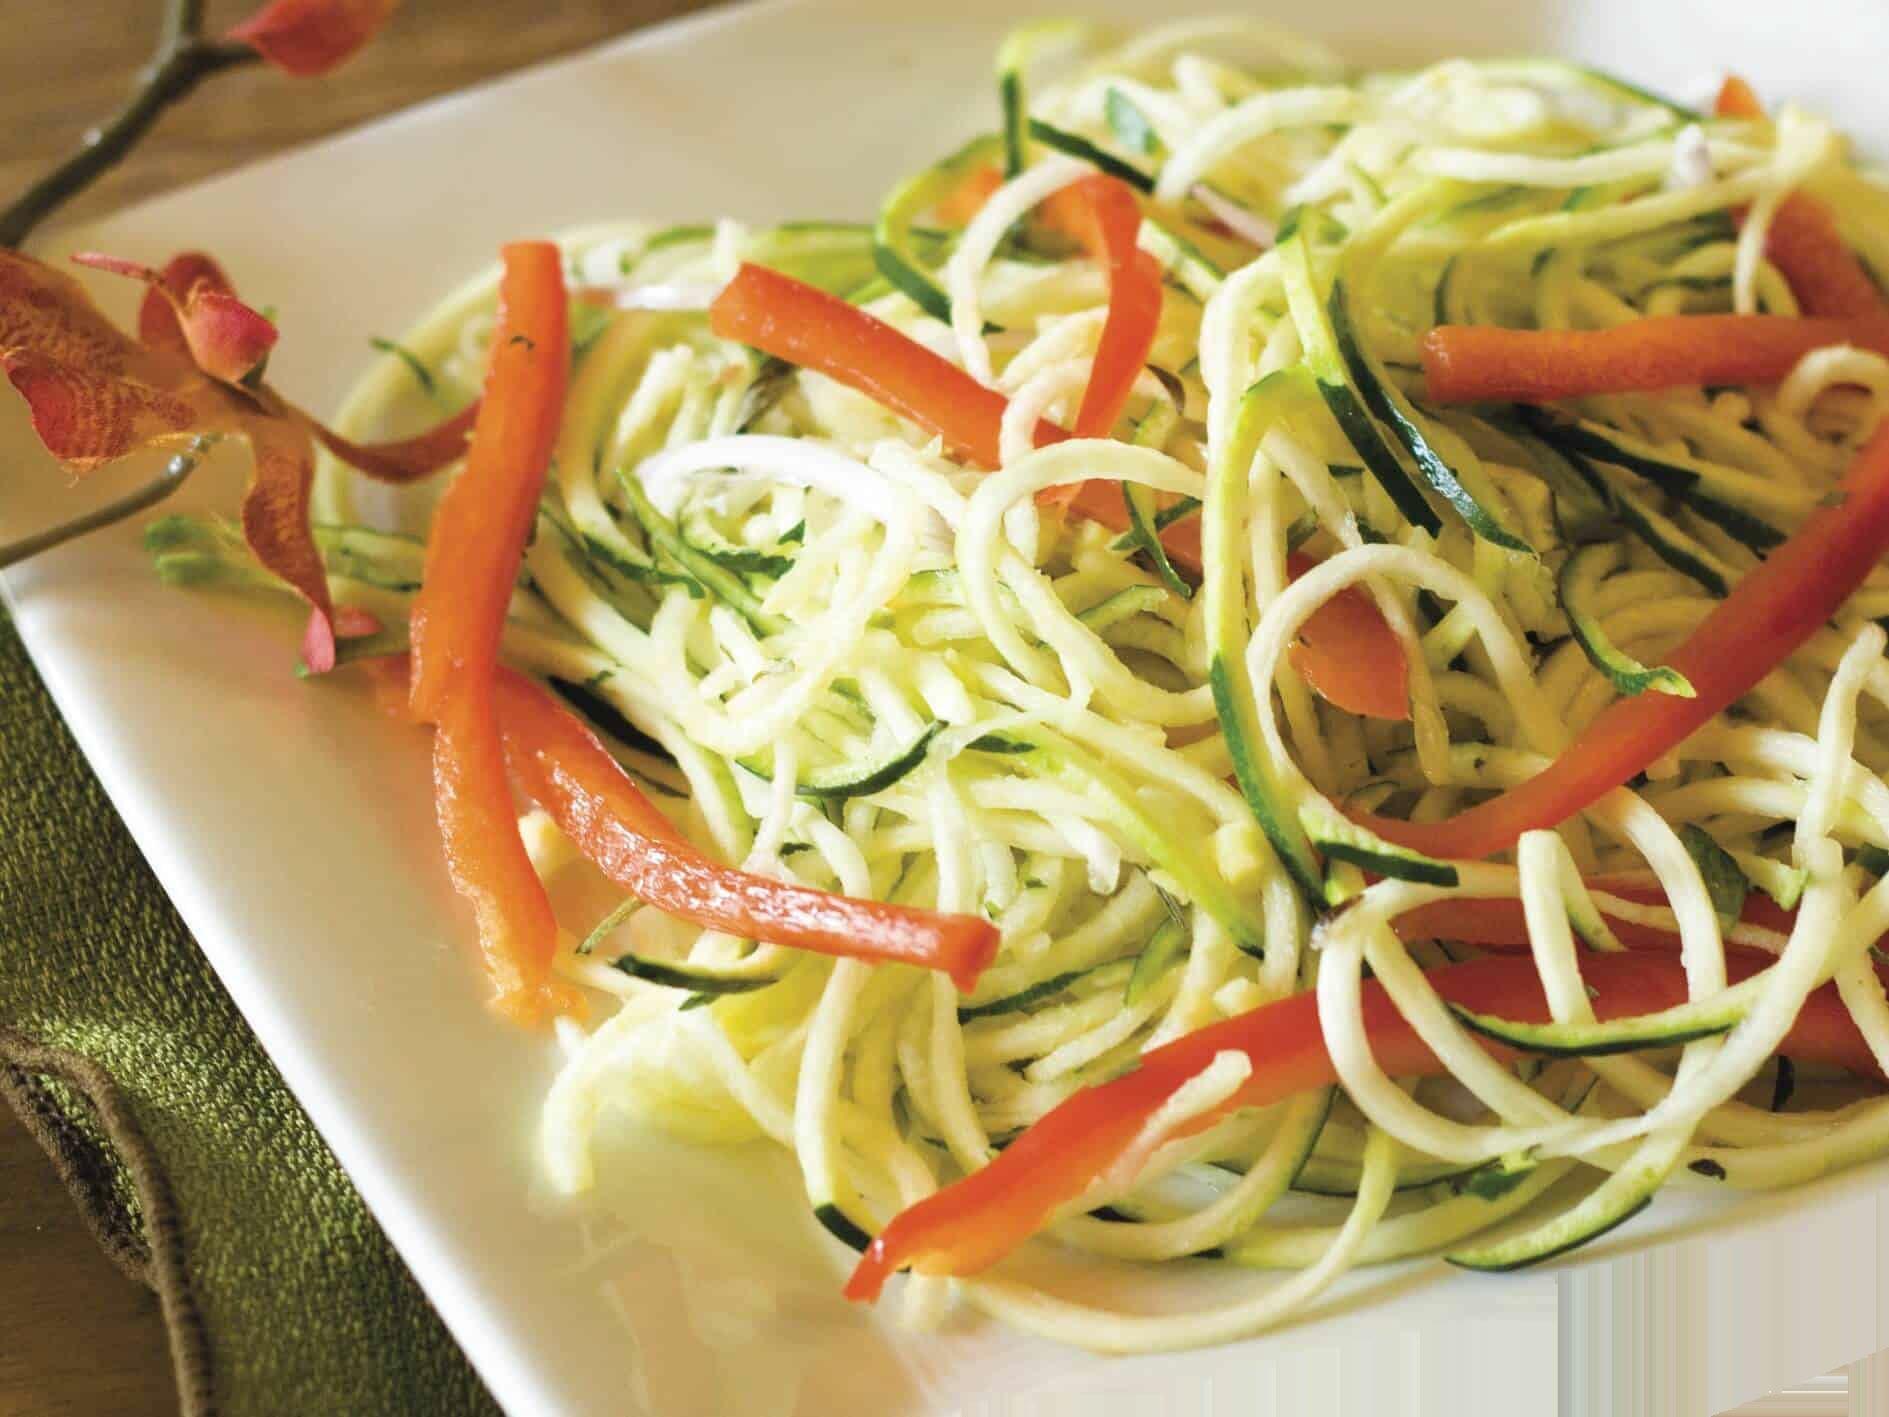 Zucchini-Noodles-with-Marinara-Sauce